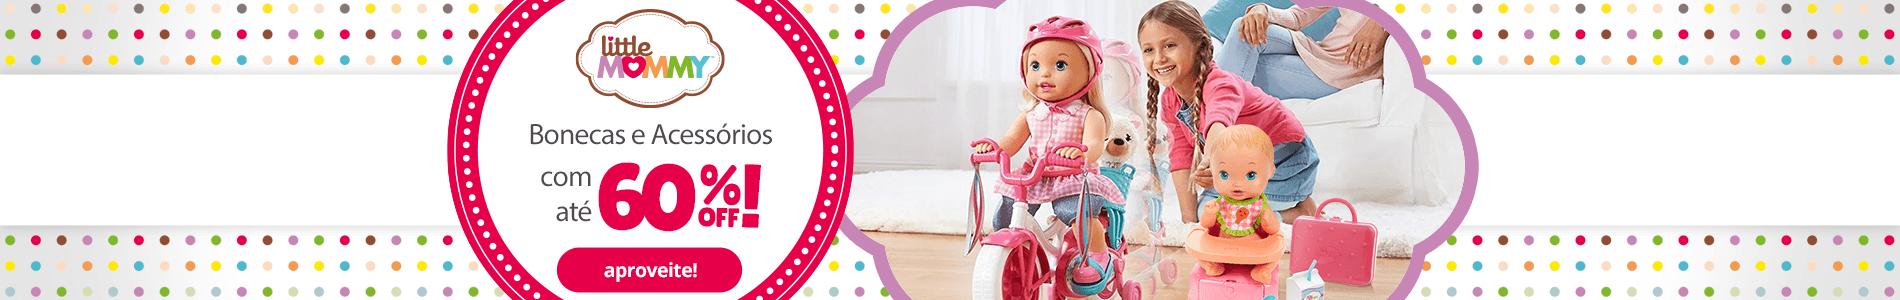 1 - Bonecas e Acessórios Little Mommy - BannerFaixa - Desktop - act